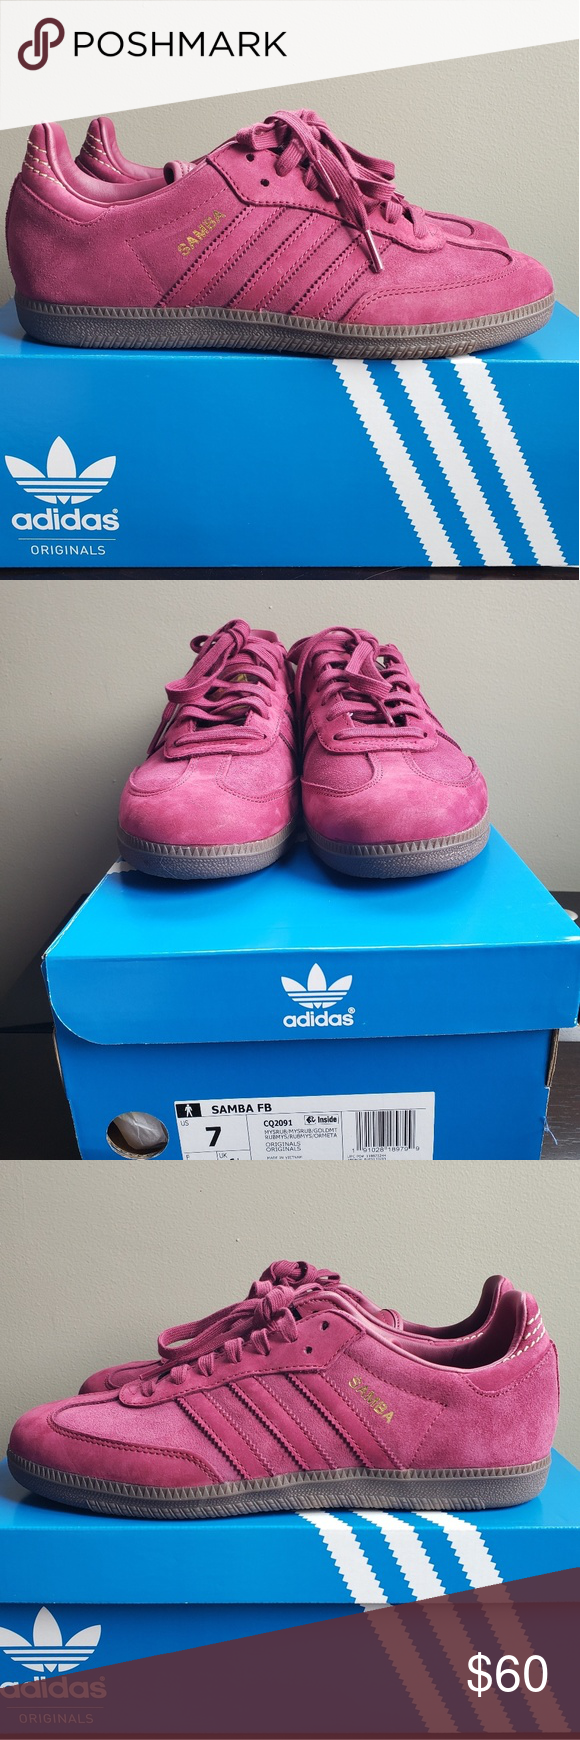 Adidas Samba FB Ruby Never worn with box. Men's size 7